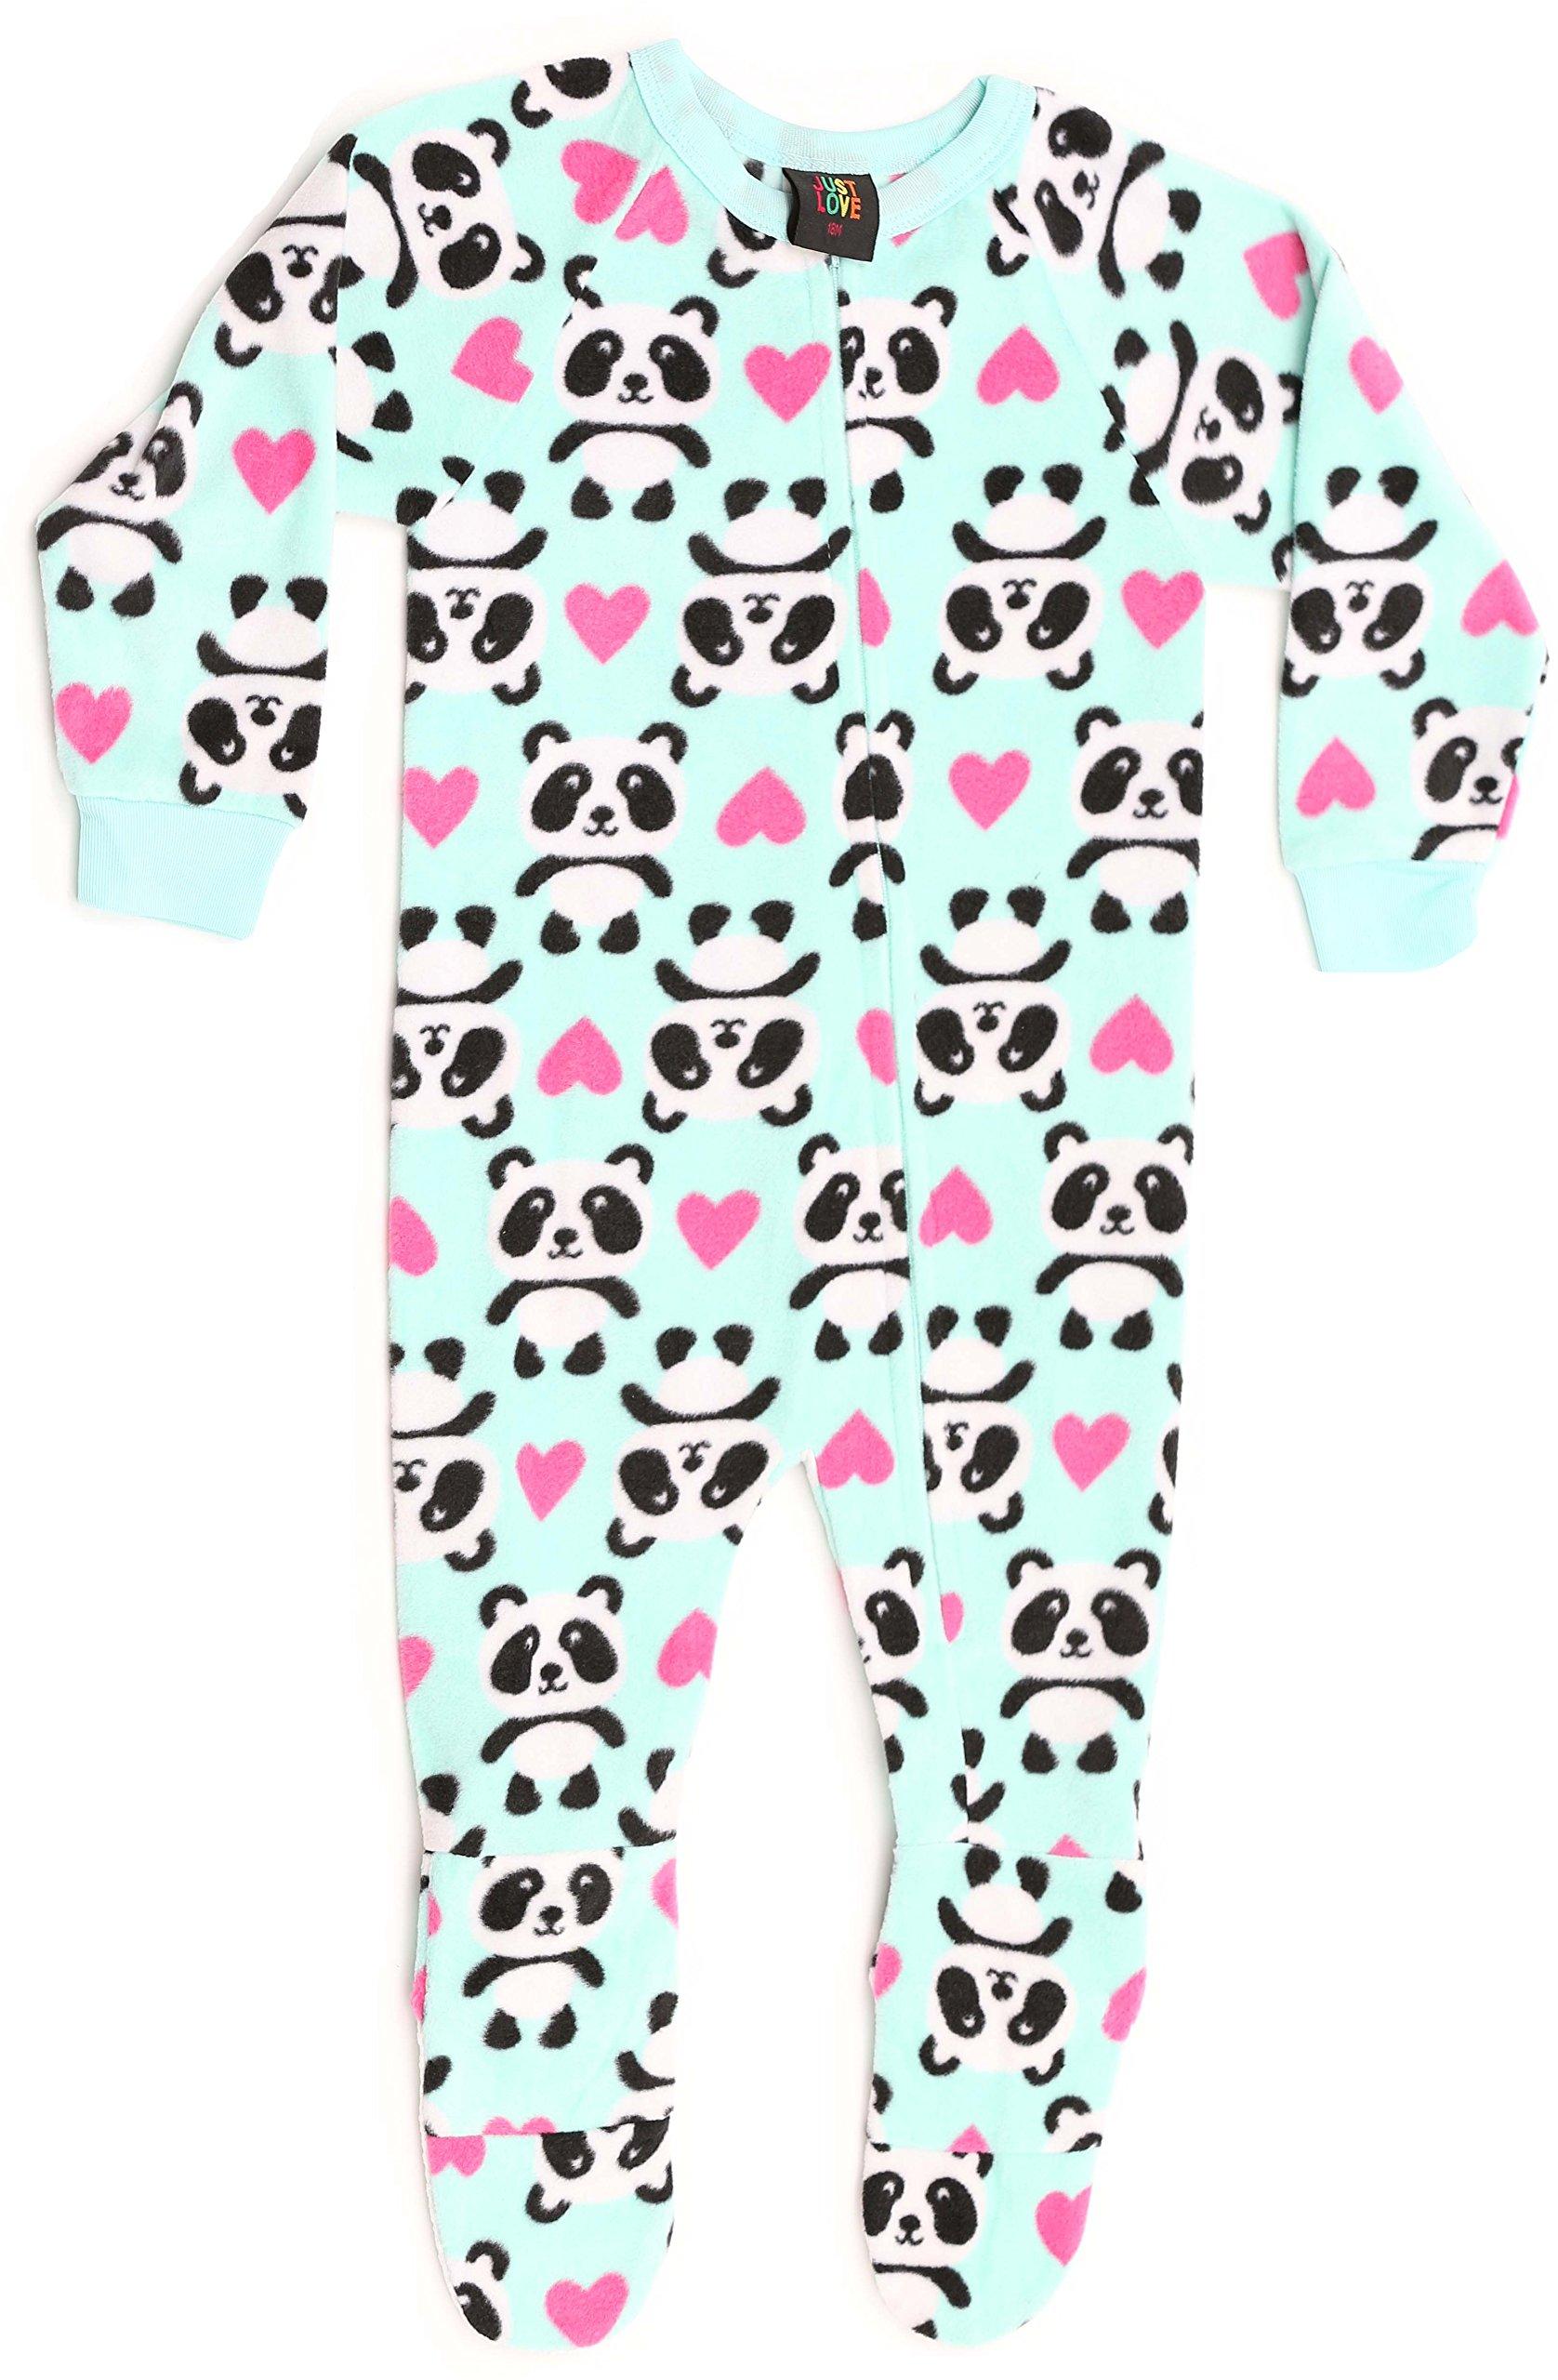 Just Love 95599-4-4T Footed Pajamas/Micro Fleece Blanket Sleepers